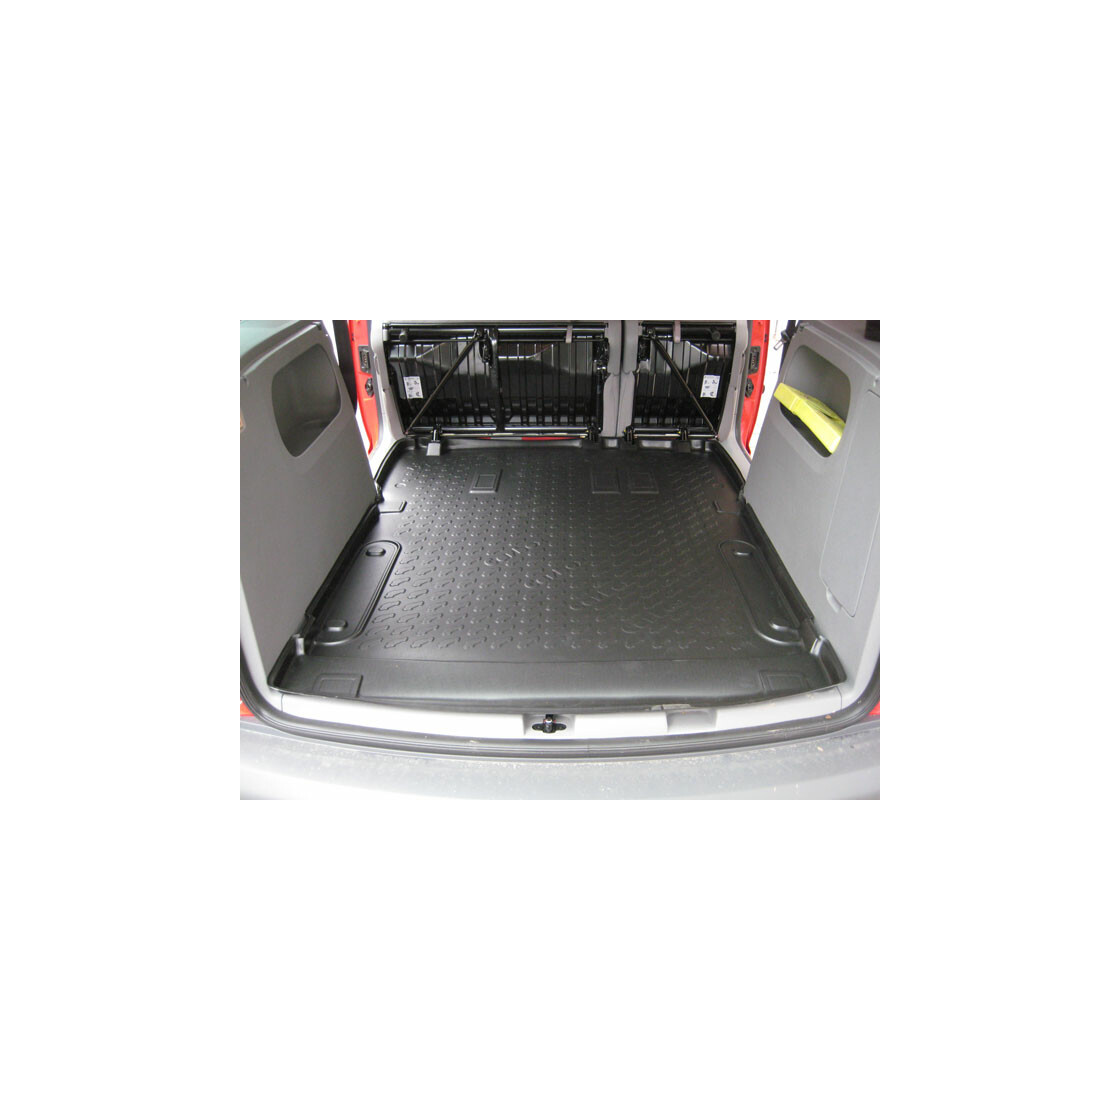 kofferraummatte cross caddy 2013 carbox kofferraumwanne. Black Bedroom Furniture Sets. Home Design Ideas